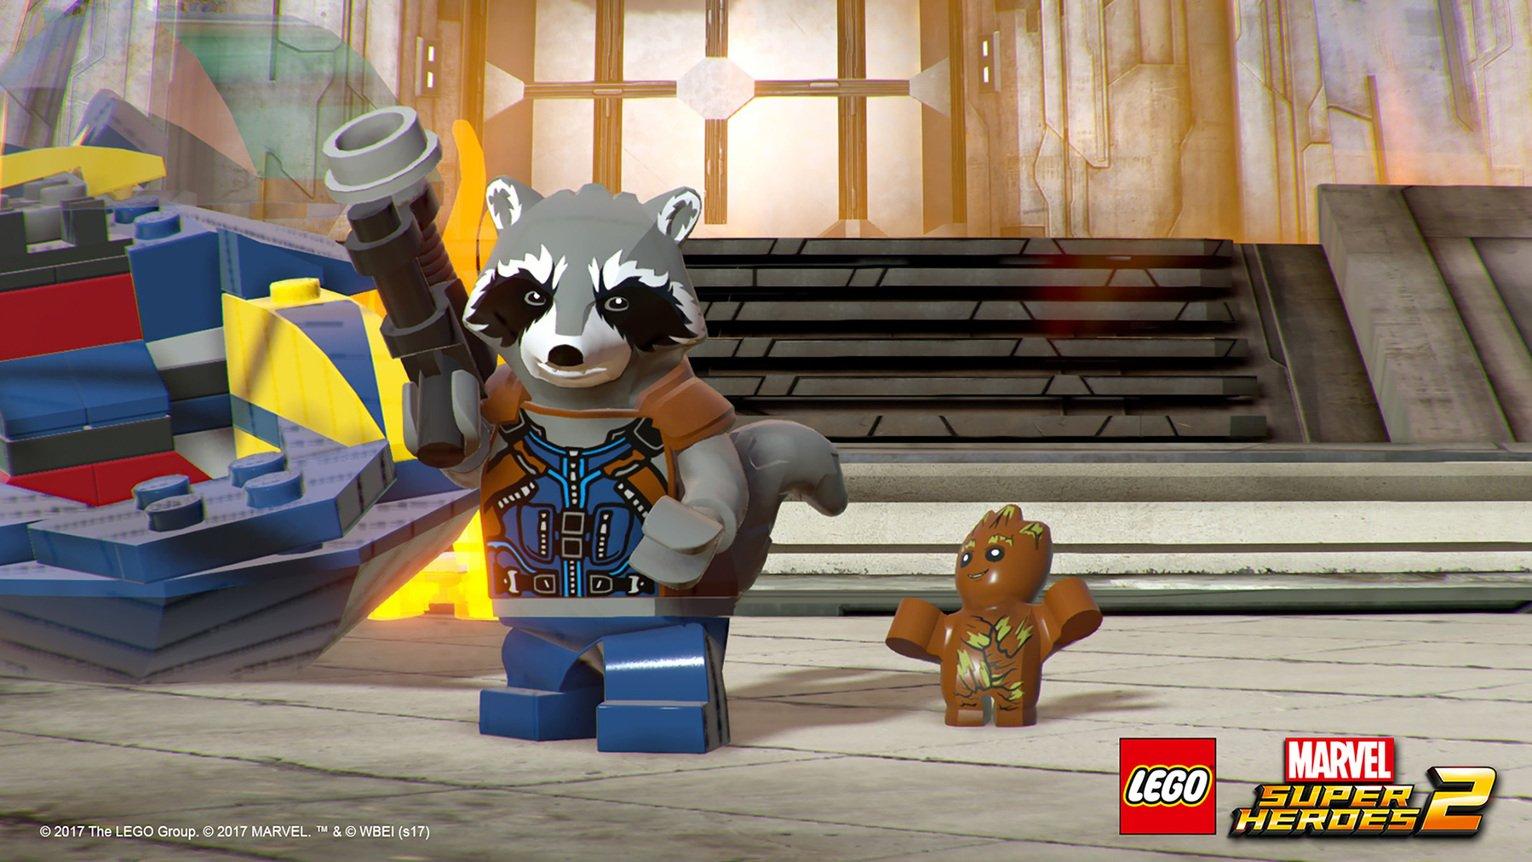 Buy Lego Marvel Super Heroes 2 Deluxe Edition Switch | Nintendo ...